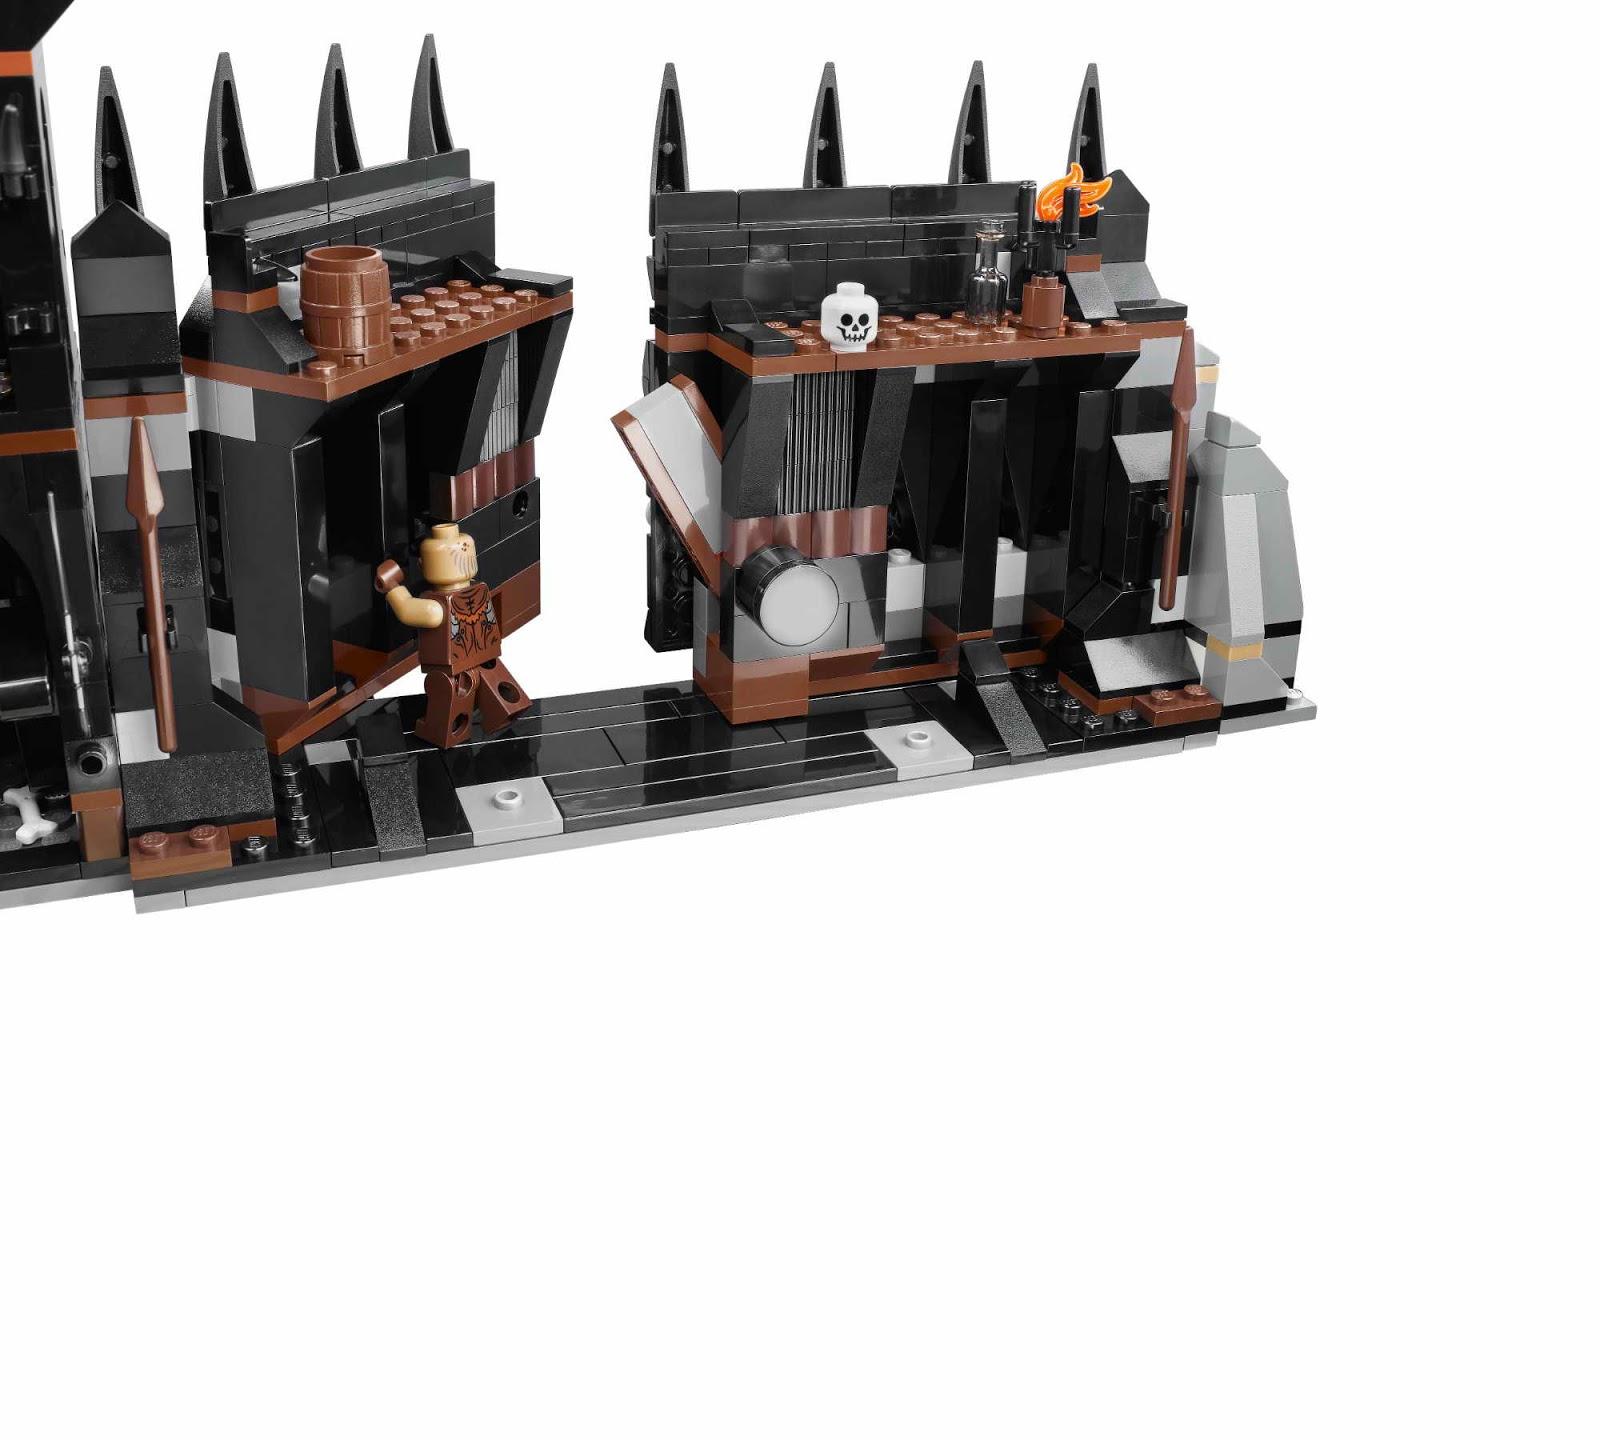 Images Of Lego Black Gate Spacehero The Lord Rings Battle At 79007 Onetwobrickcom Set Database